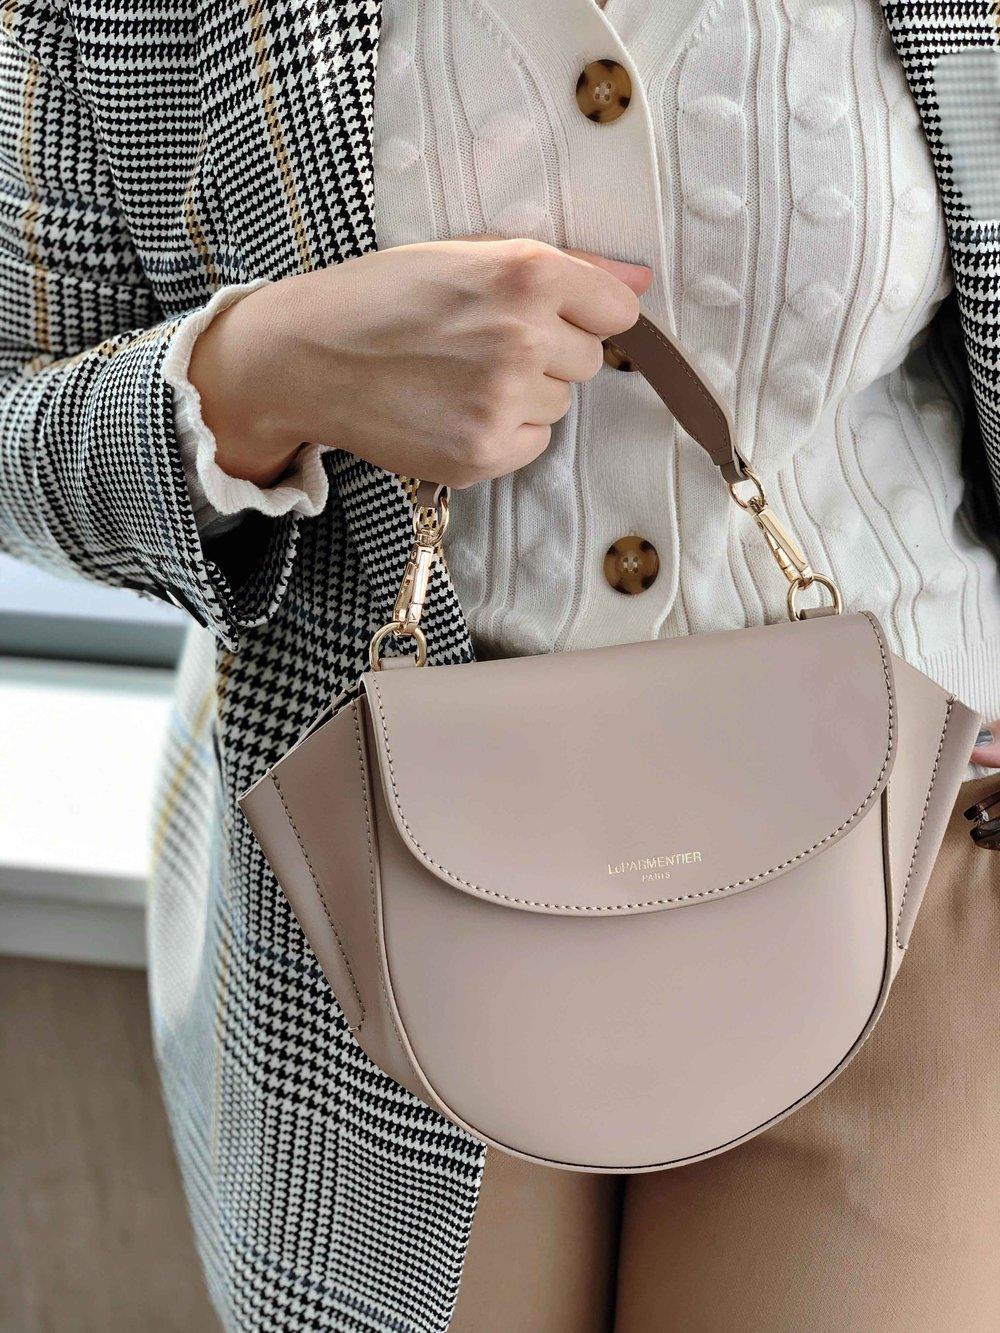 New Spring Bag - Le Parmentier Astorya Mini Bag